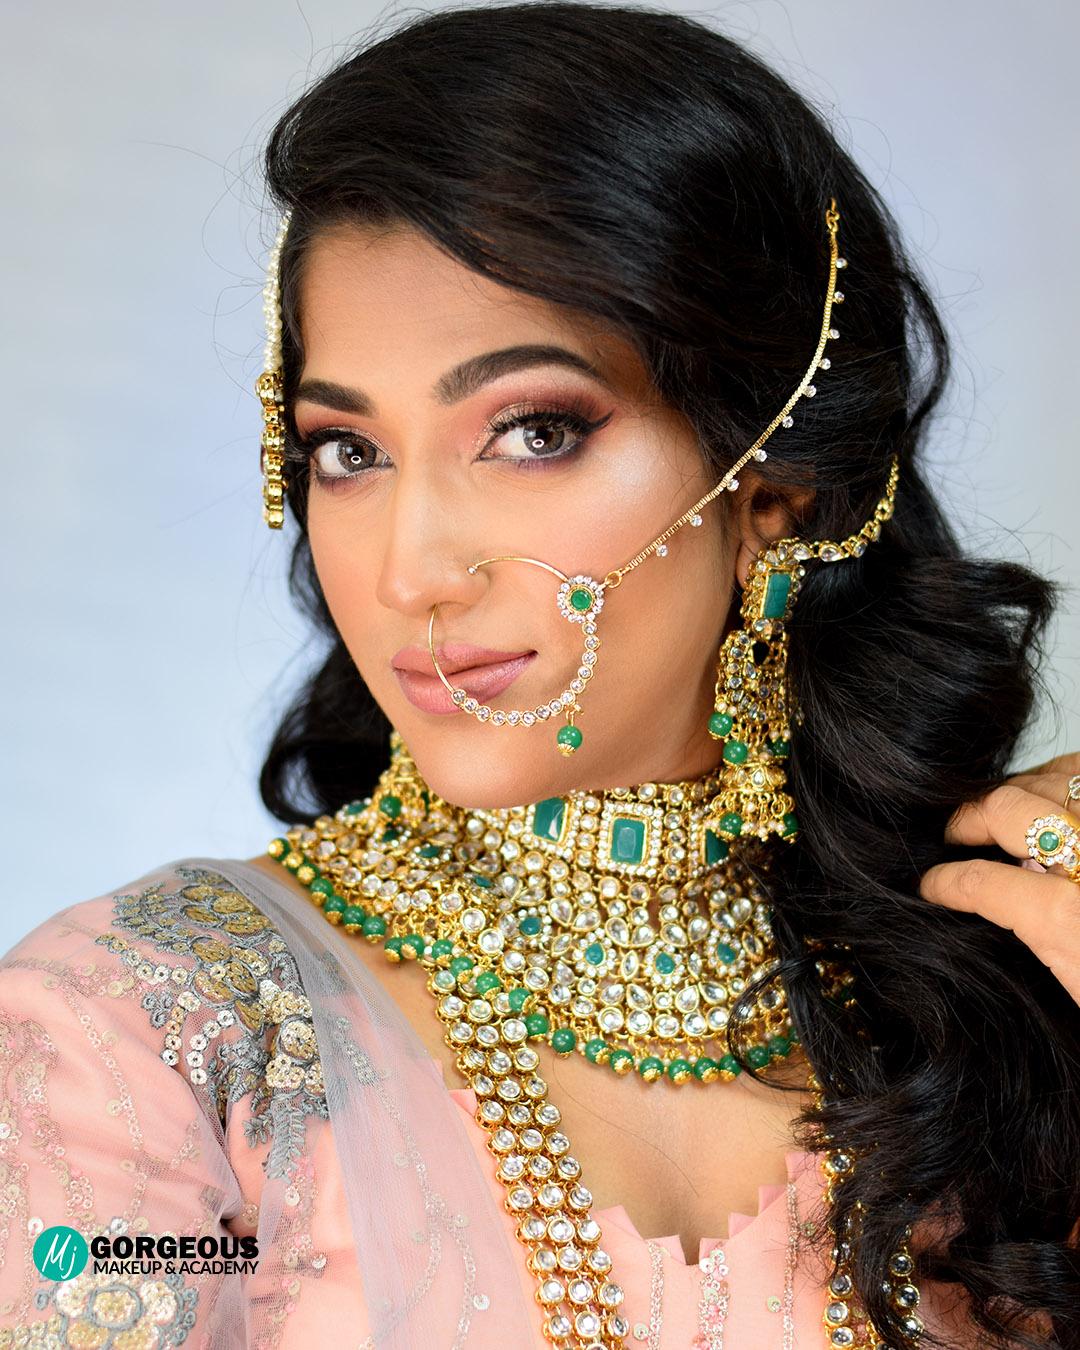 makeup courses in bangalore - Airbrush Makeup Bangalore